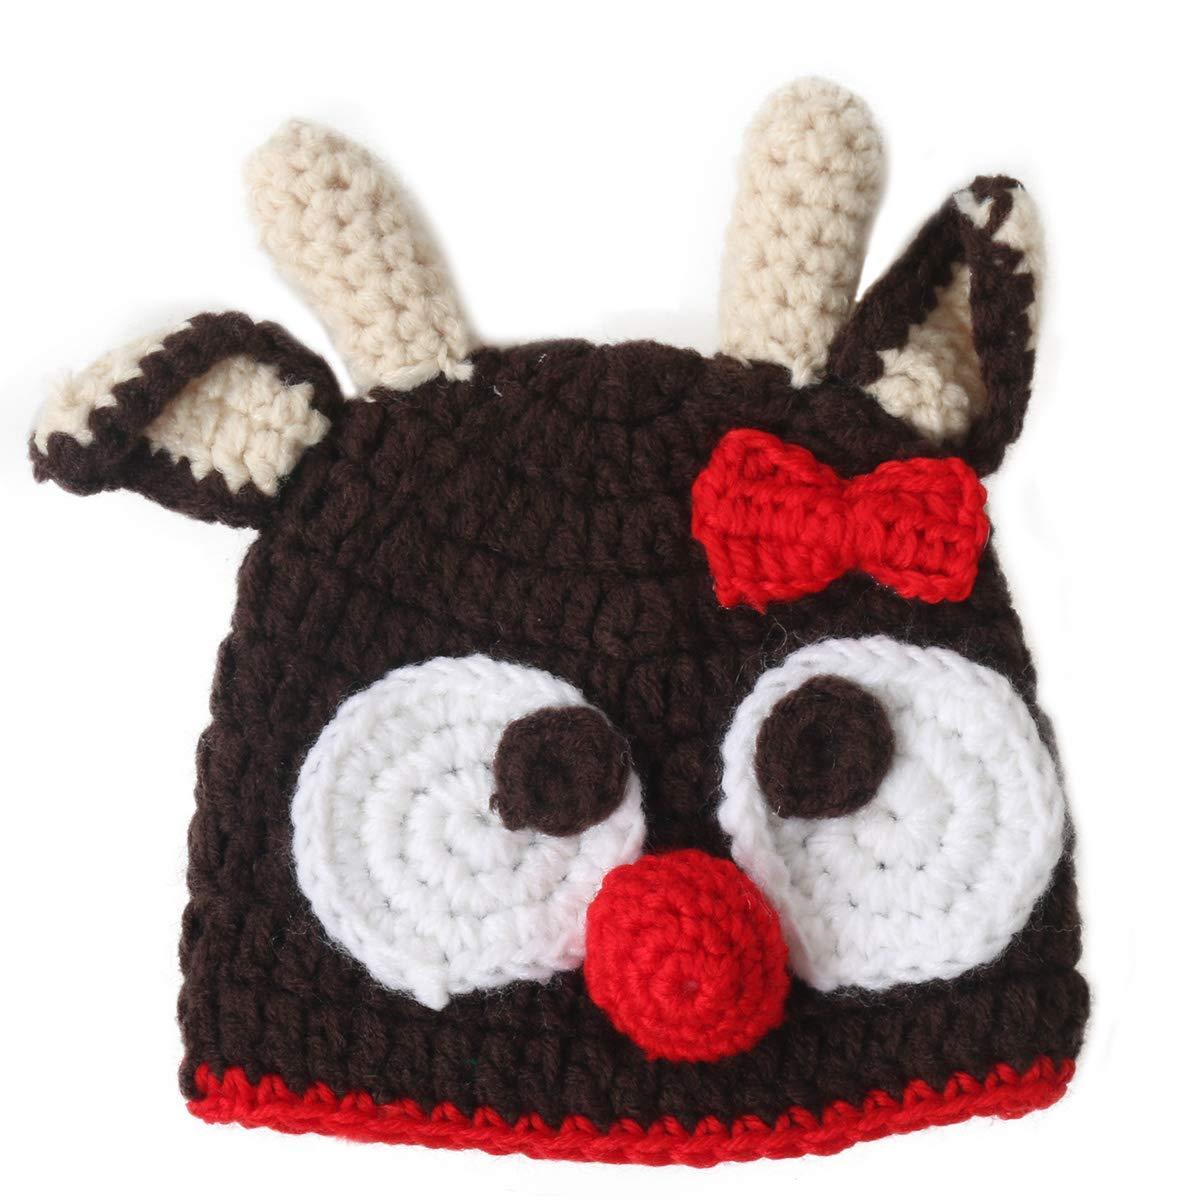 Ypser Baby Thanksgiving Christmas Beanie Turkey Knitted Cap Elk Hat Photo Prop YPSUSSN1052